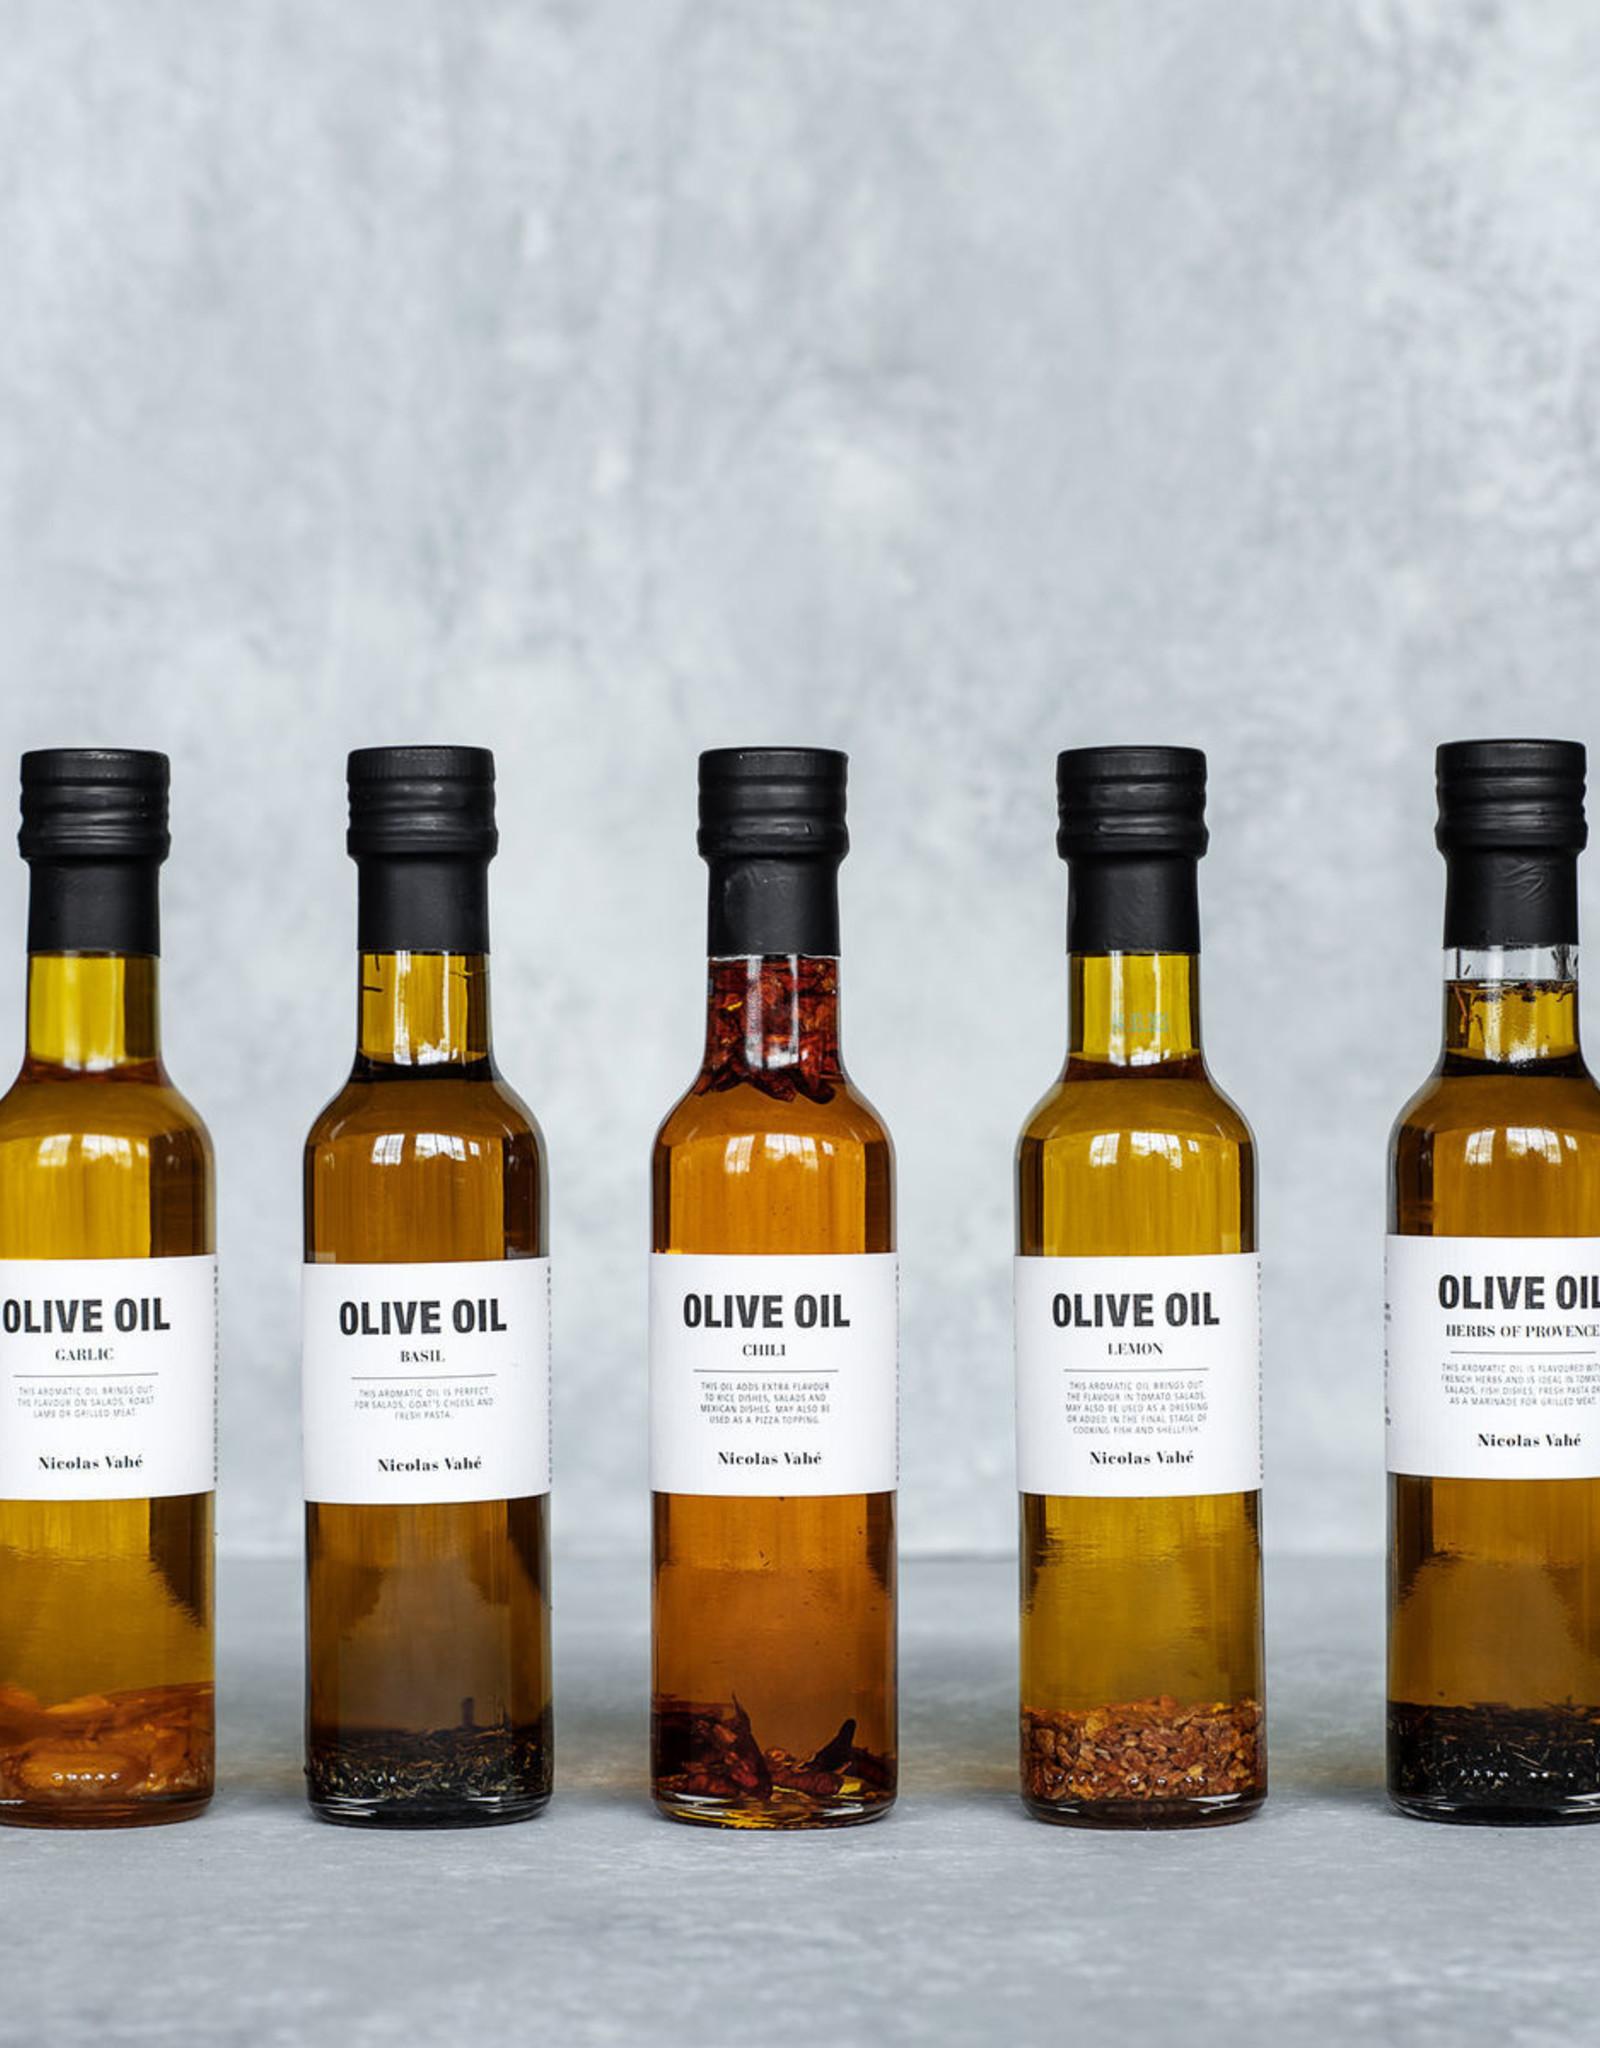 Nicolas Vahé Nicolas Vahe olive oil Basil